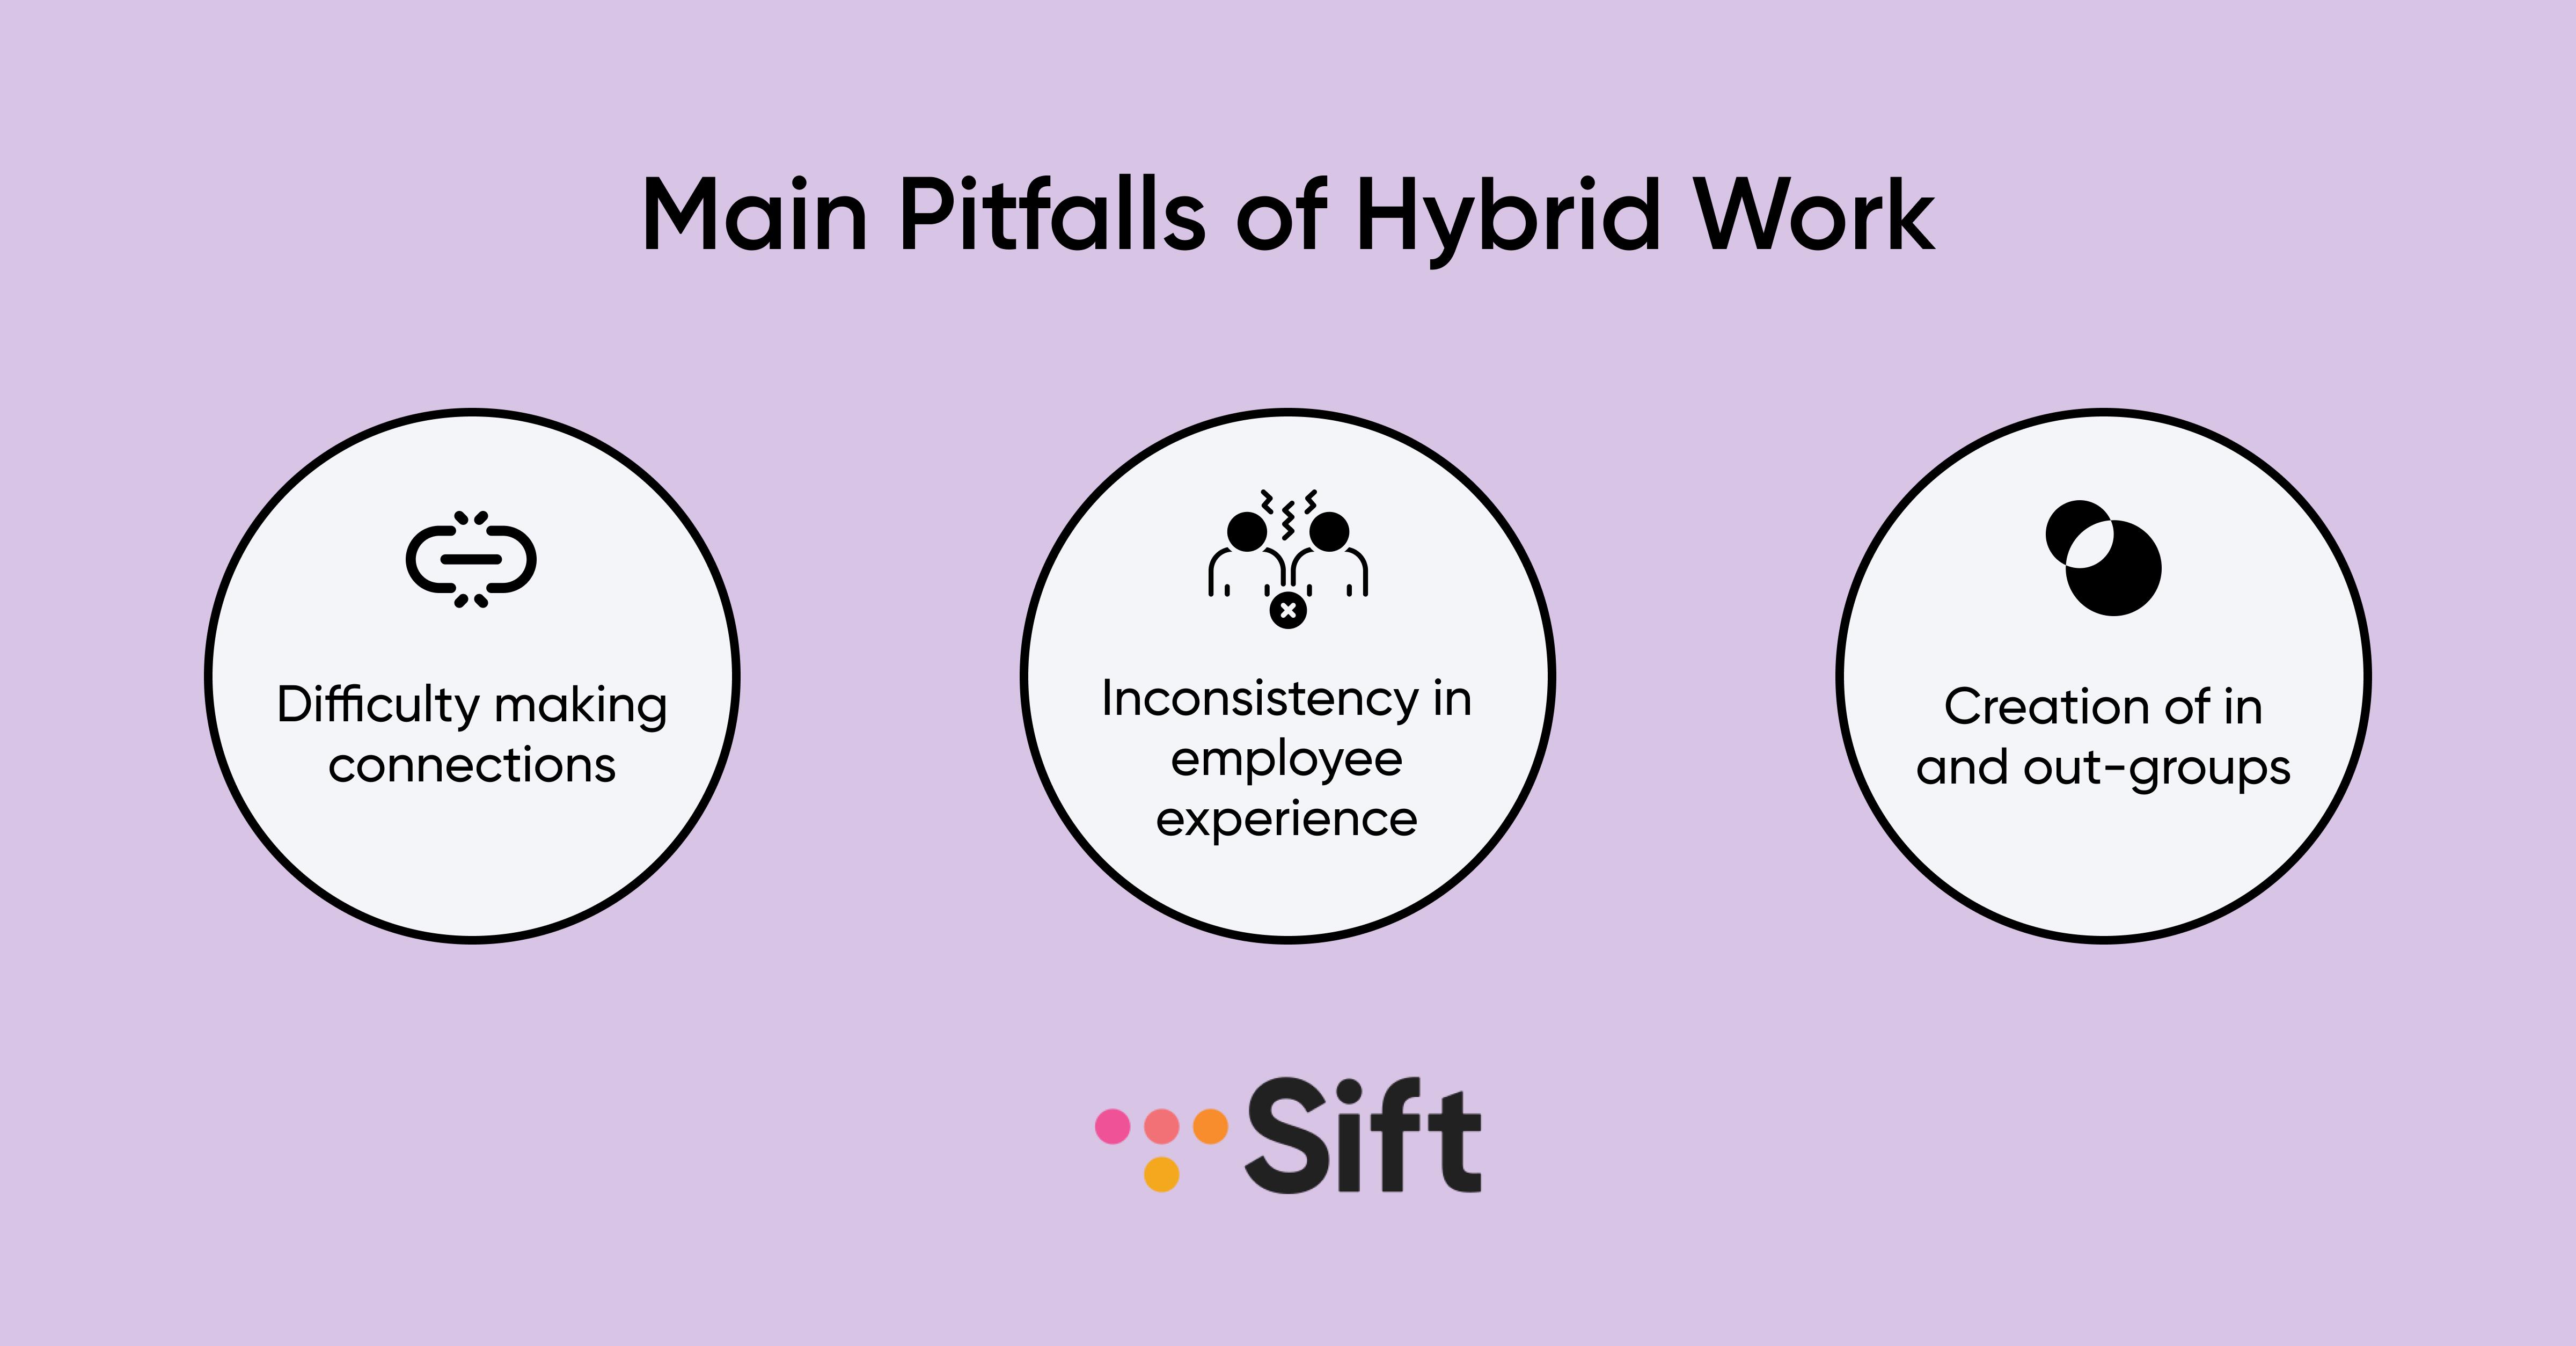 Main pitfalls of hybrid work